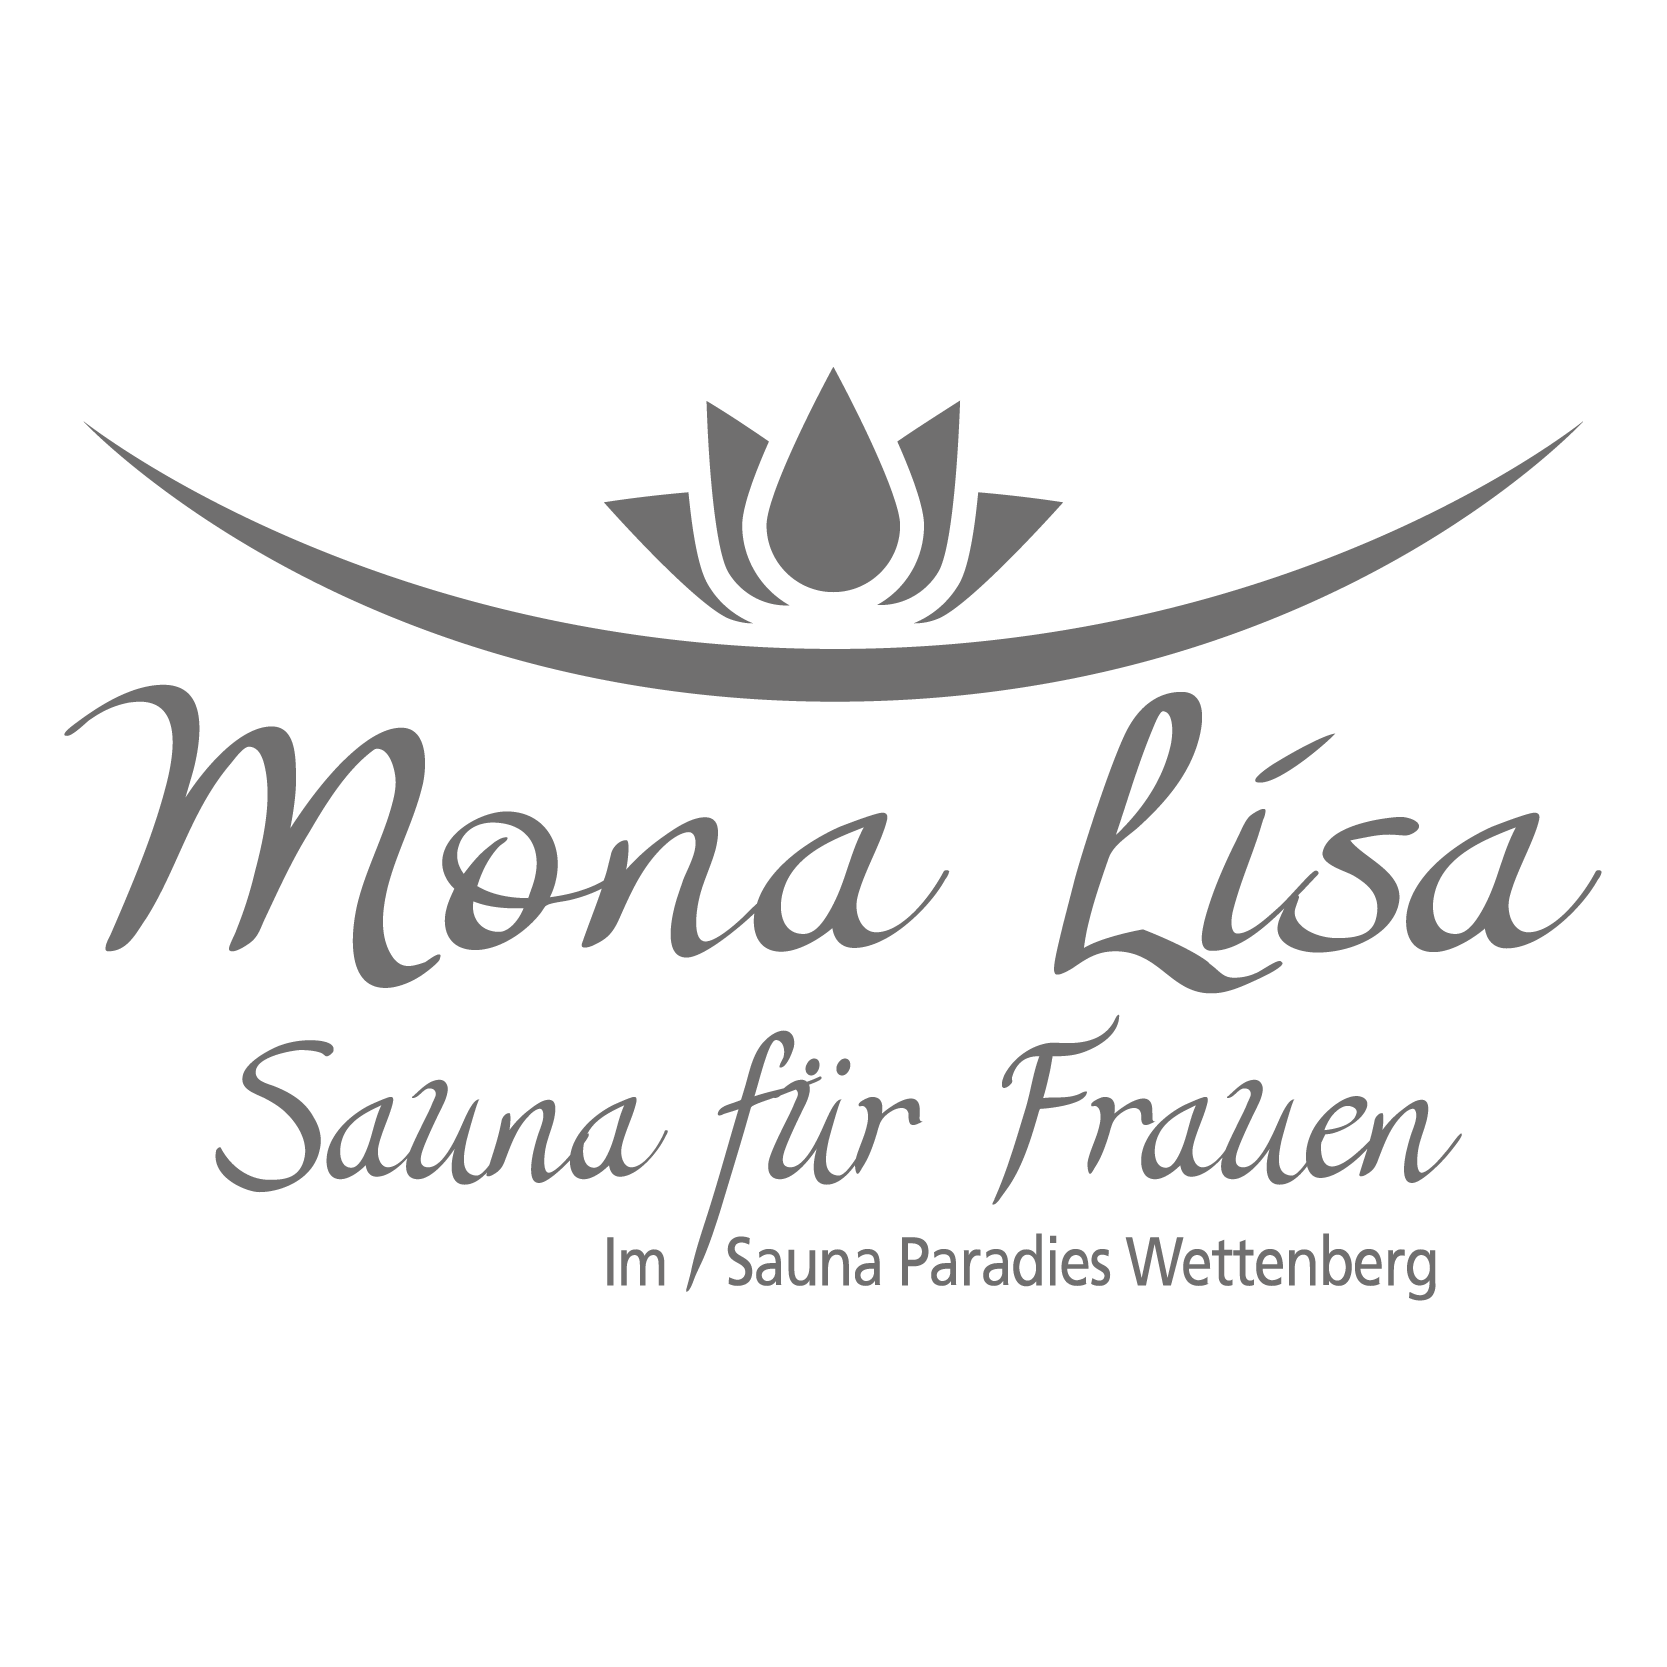 Saunaparadies Wettenberg - Mona Lisa